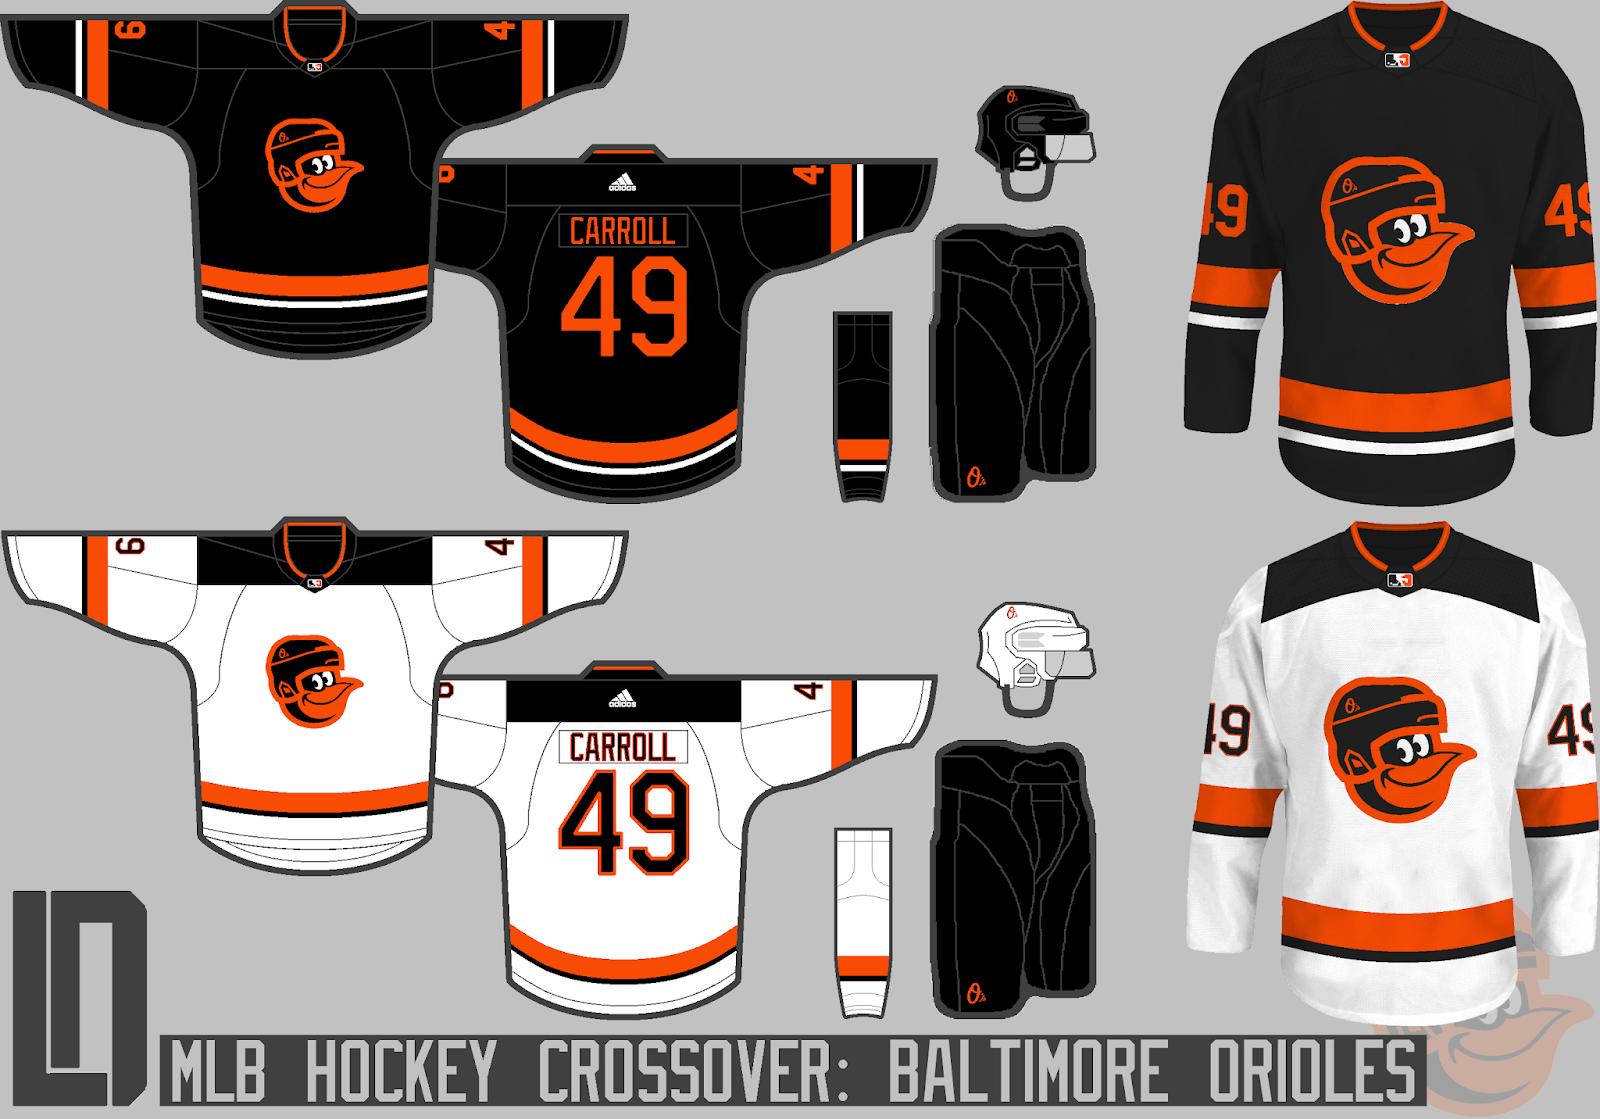 Baltimore+Orioles+Concept.png